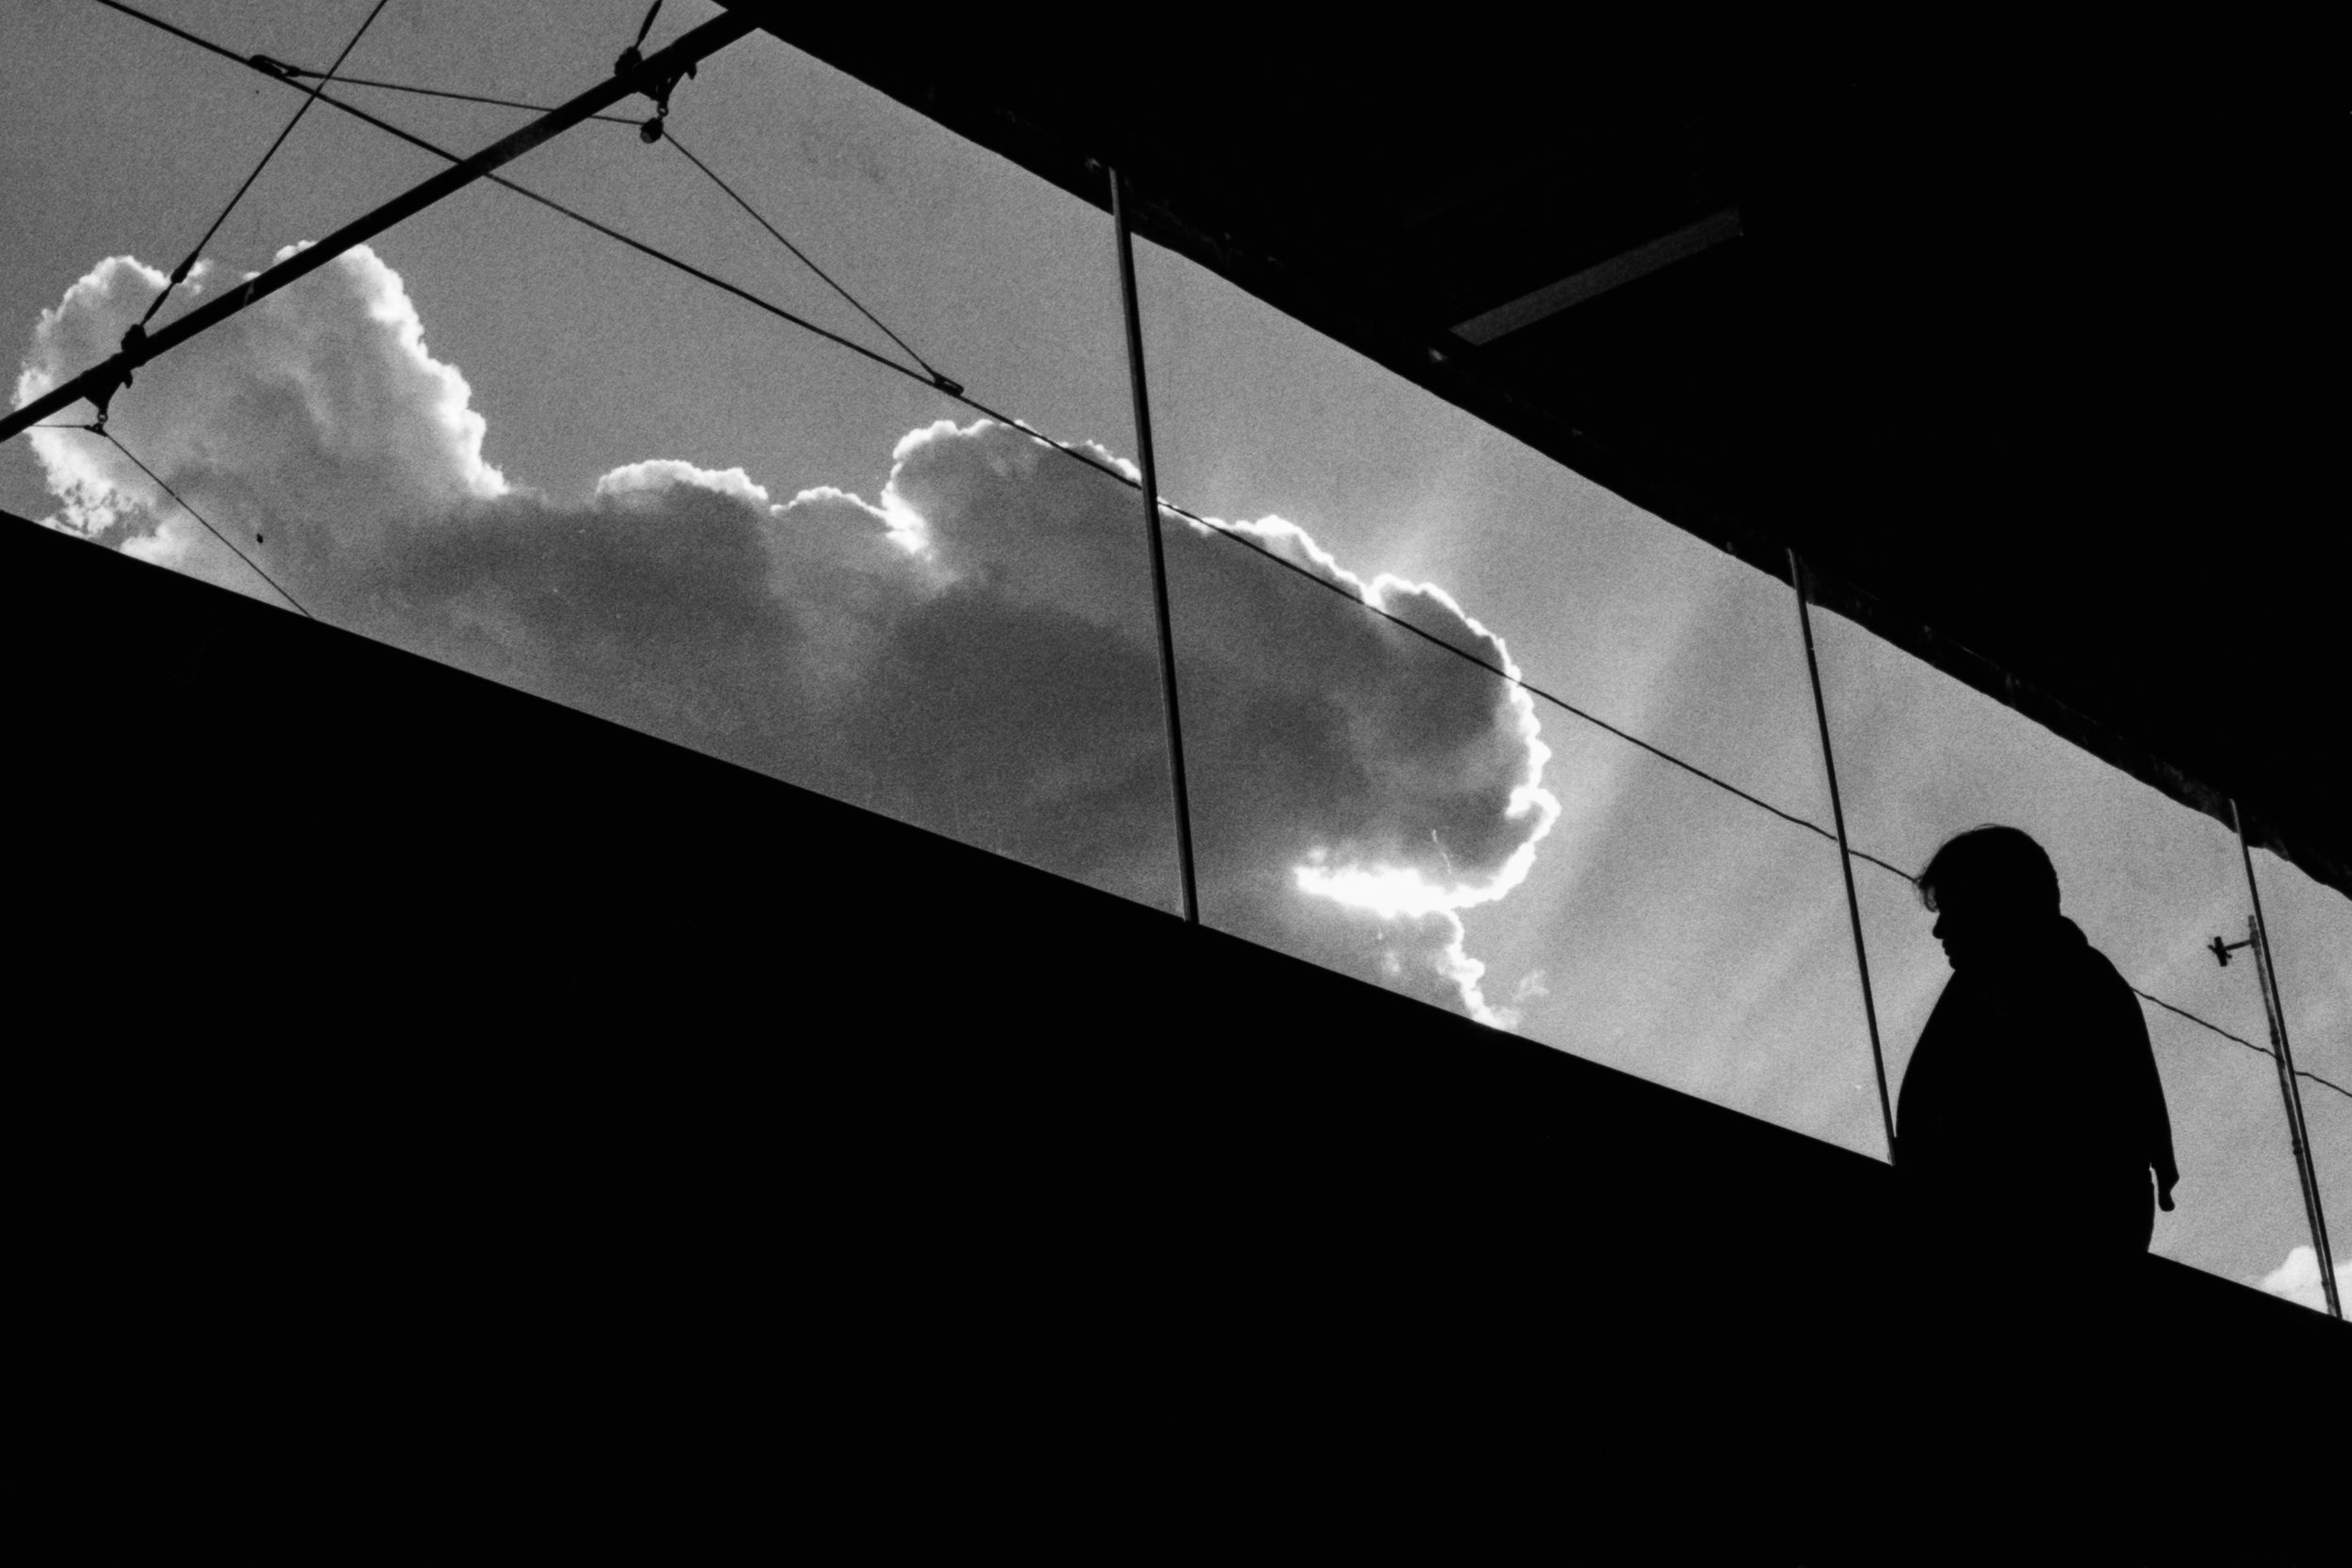 silhouette in the sky | Canon A-1 | Agfa APX400 | Daniel Stoessel